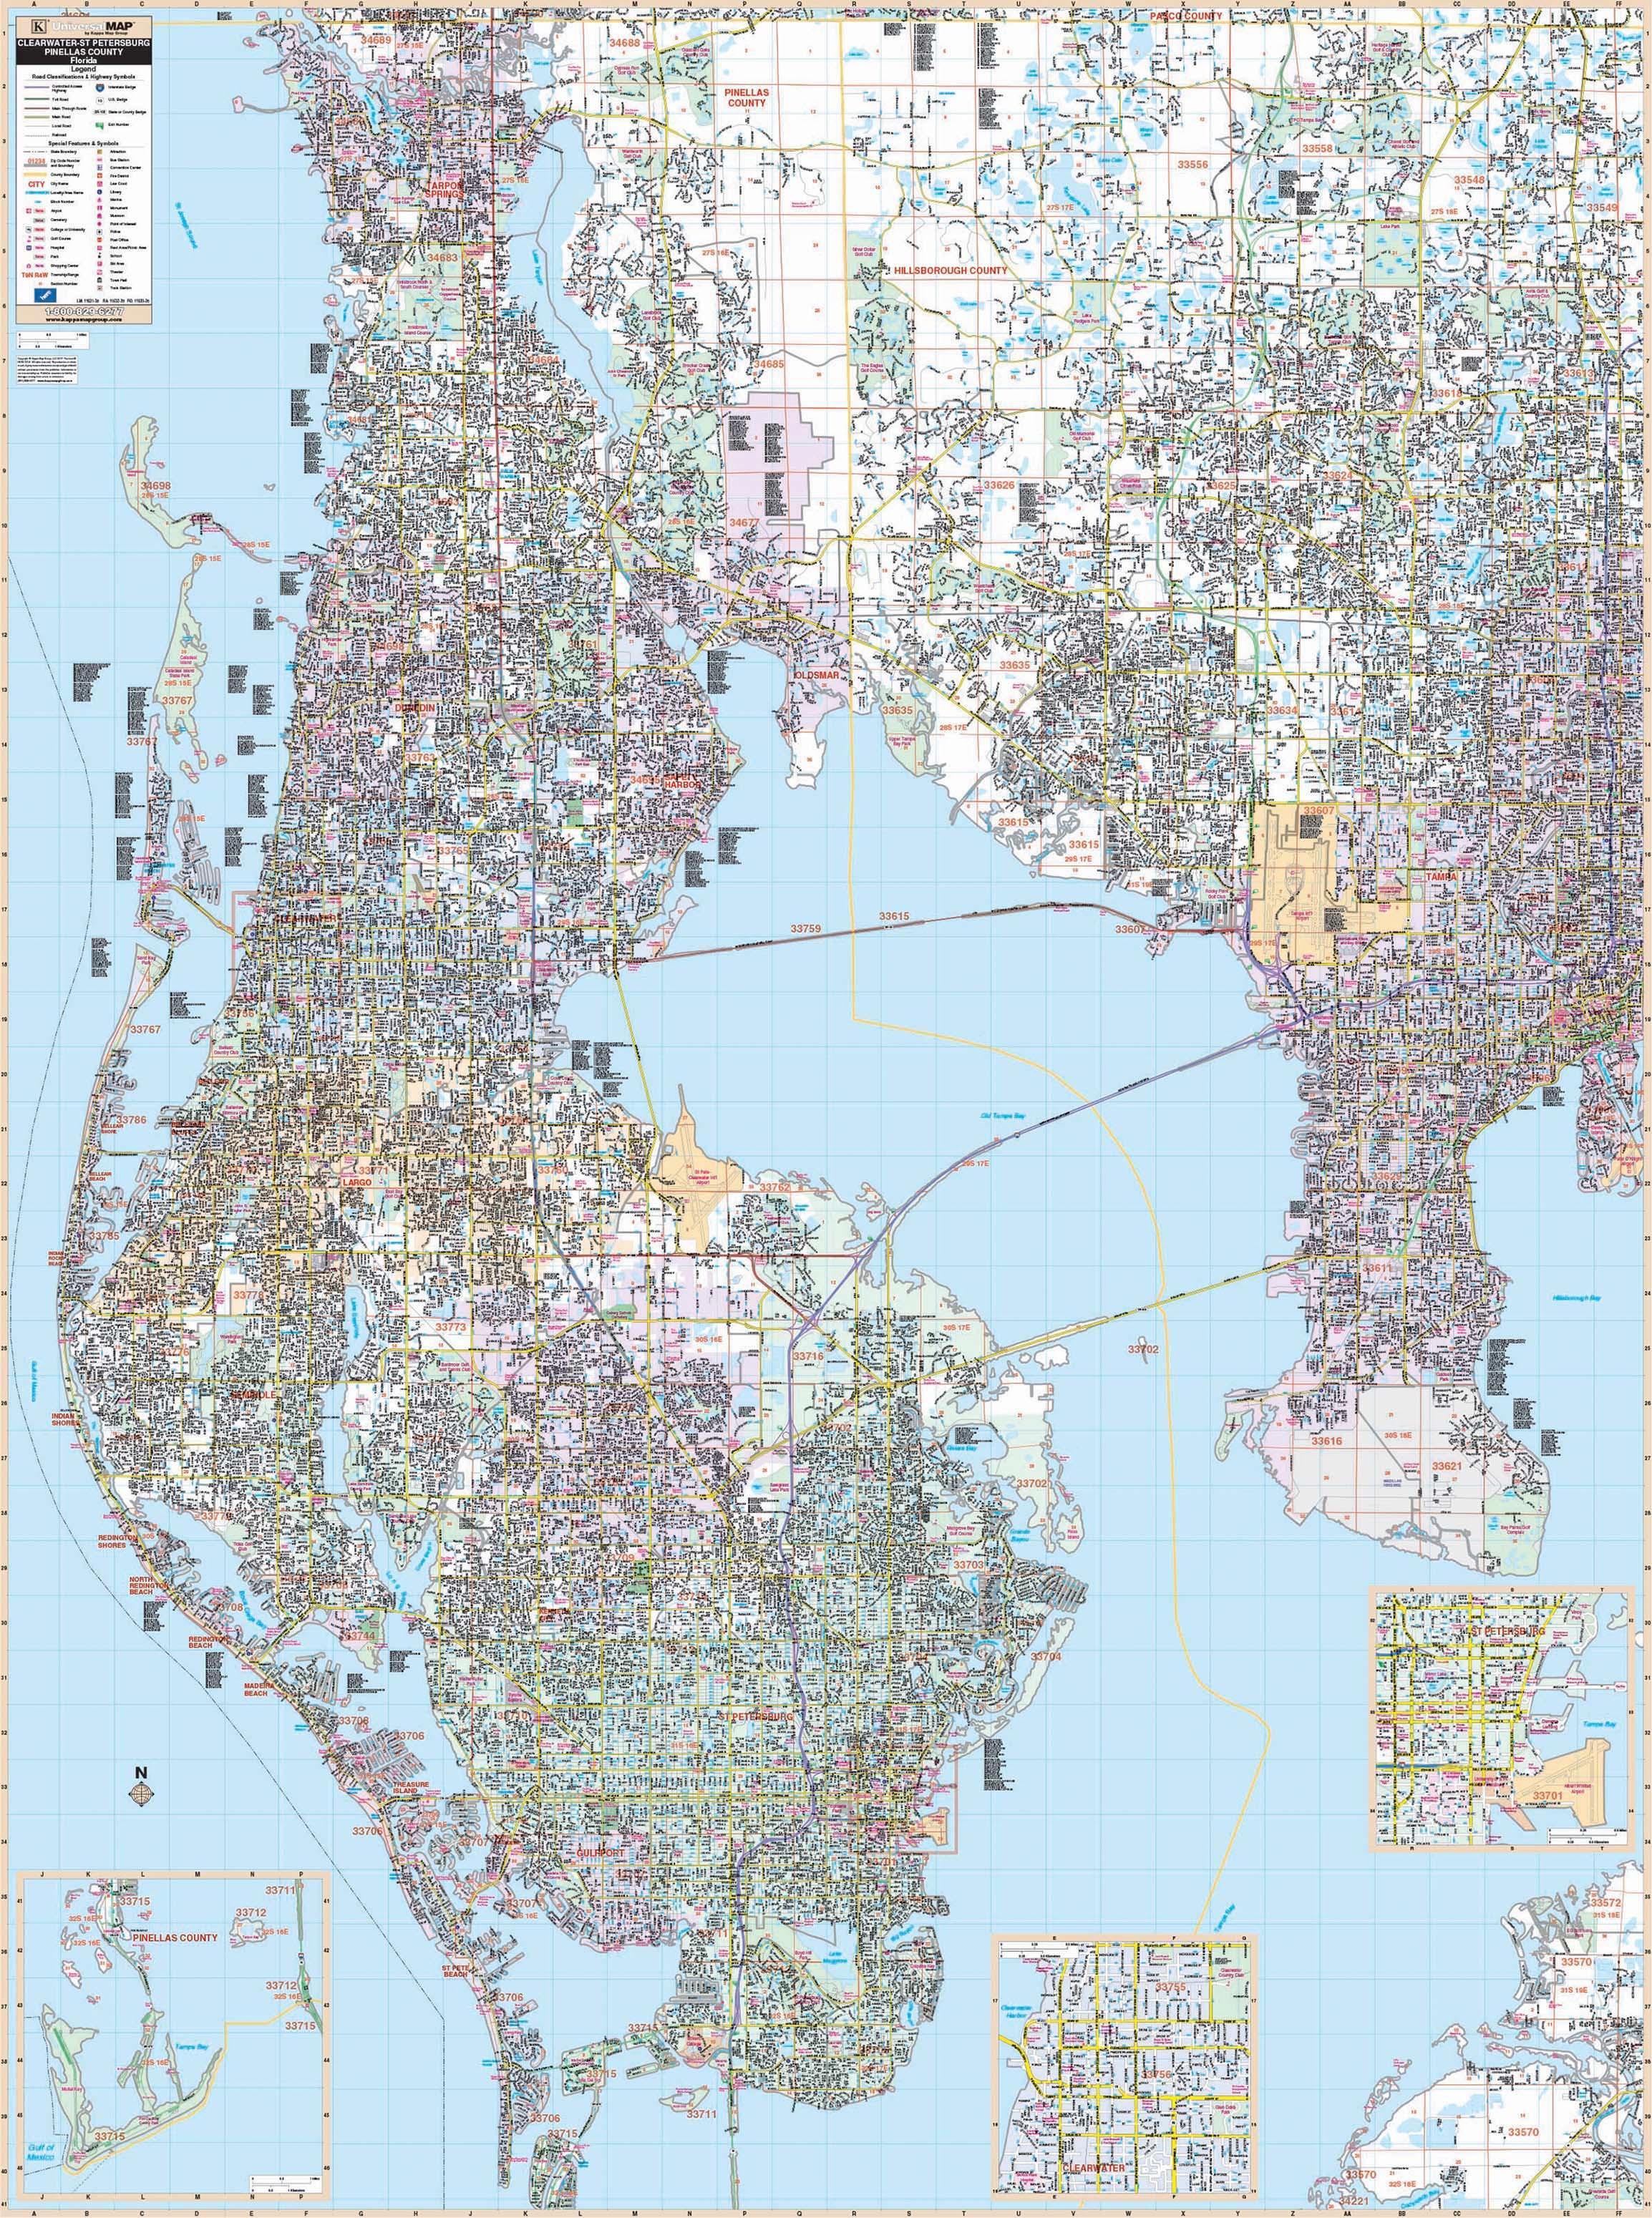 Pinellas County, Fl Wall Map – Kappa Map Group - Map Of Pinellas County Florida